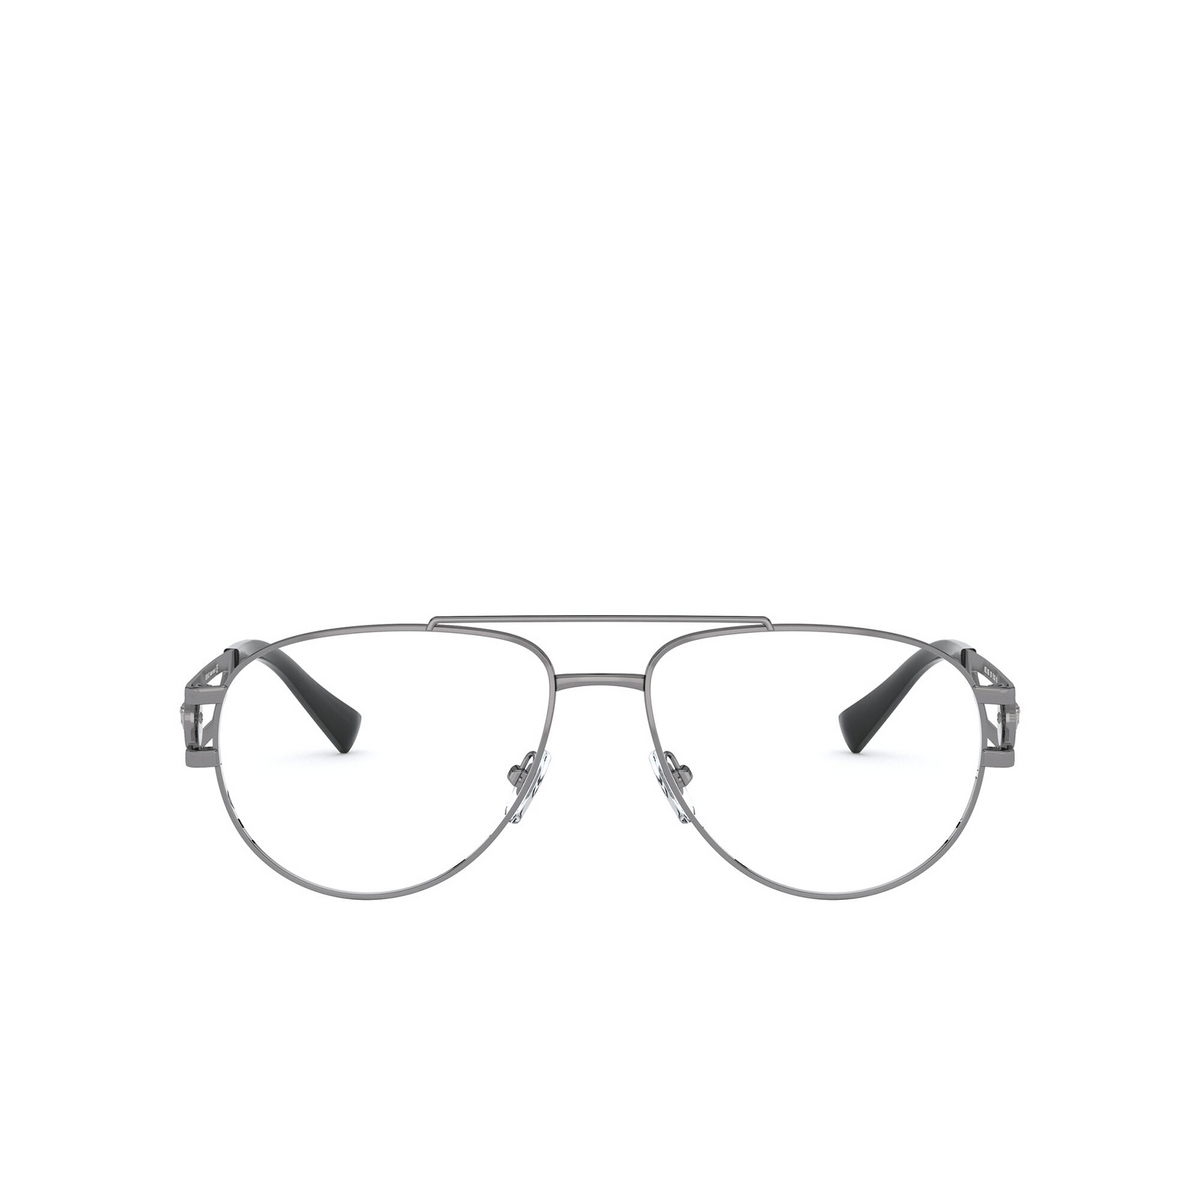 Versace® Aviator Eyeglasses: VE1269 color Gunmetal 1001 - front view.